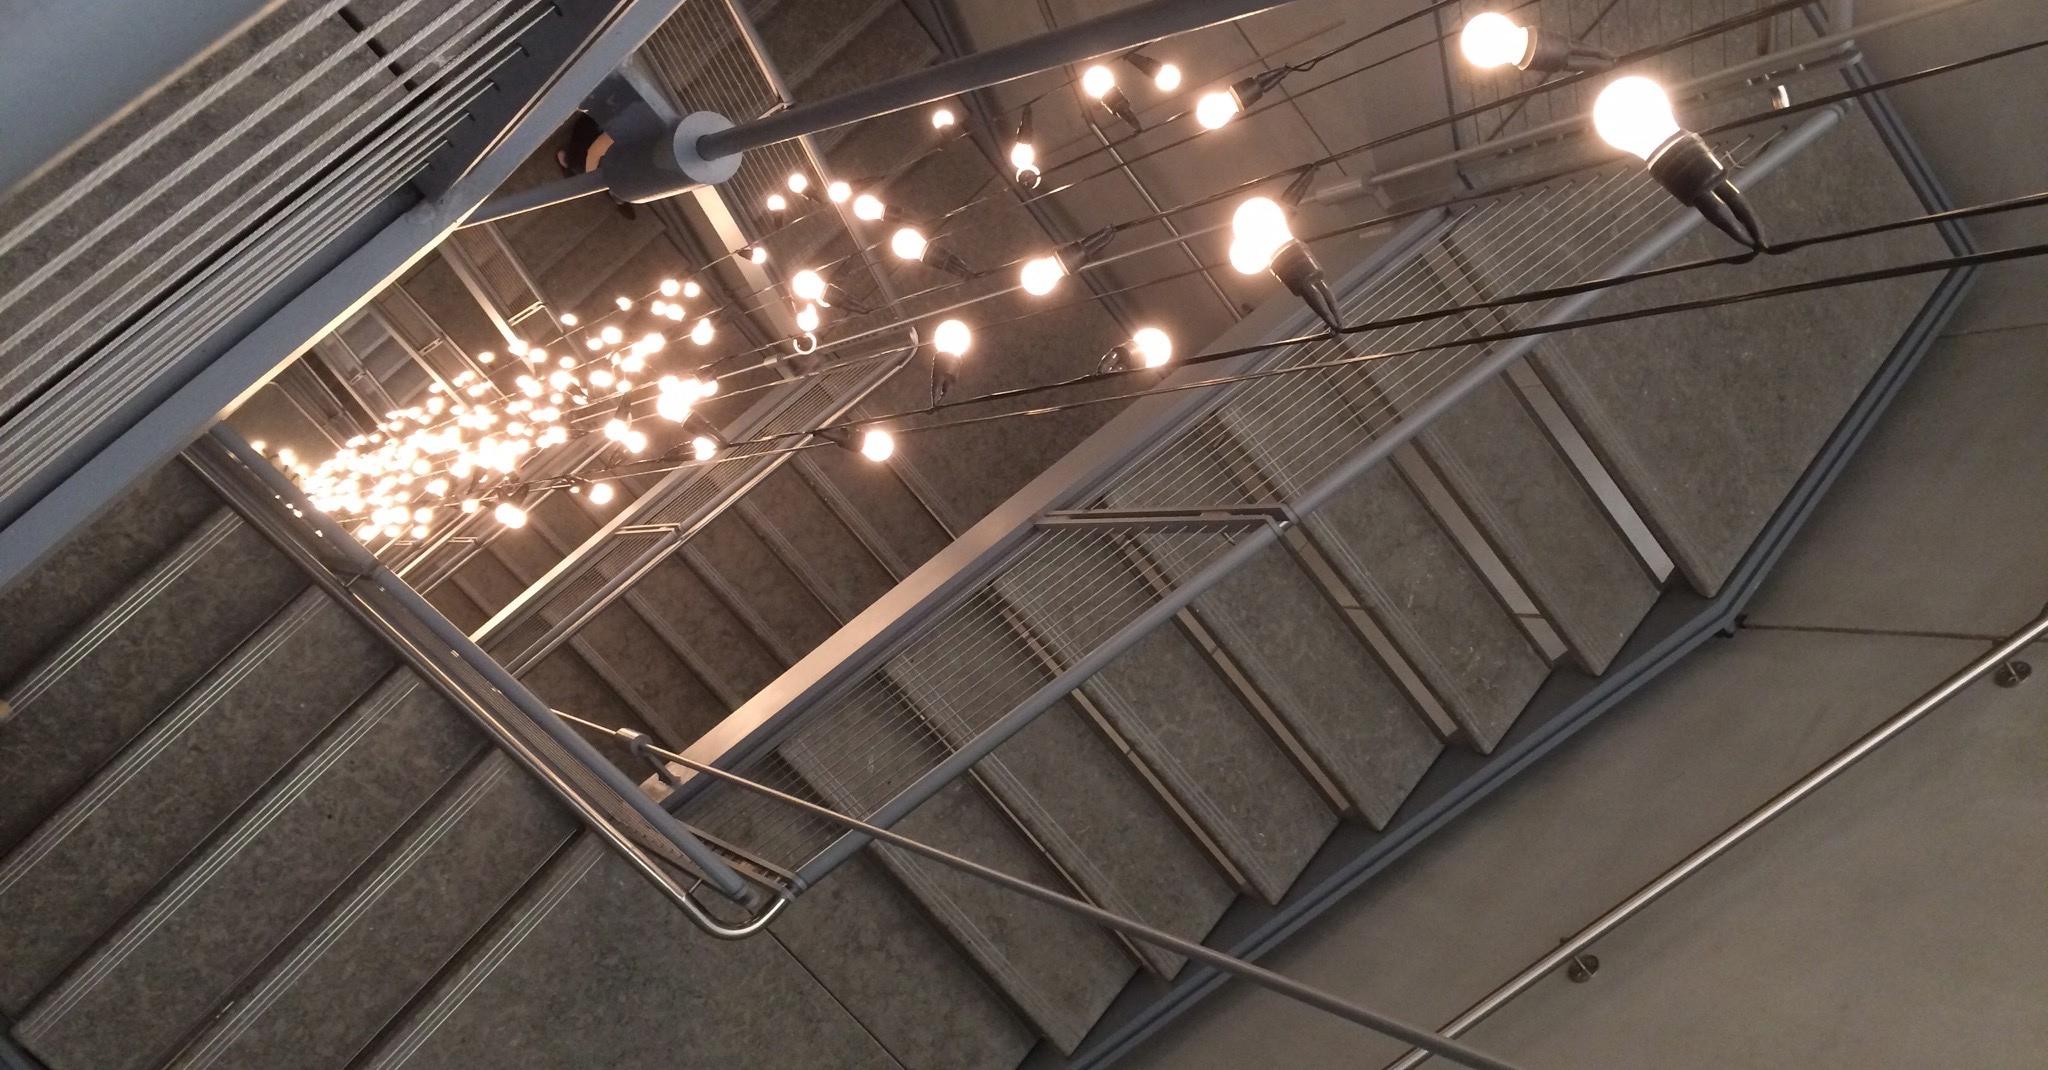 Installation of  Untitled  by Felix Gonzalez-Torres.